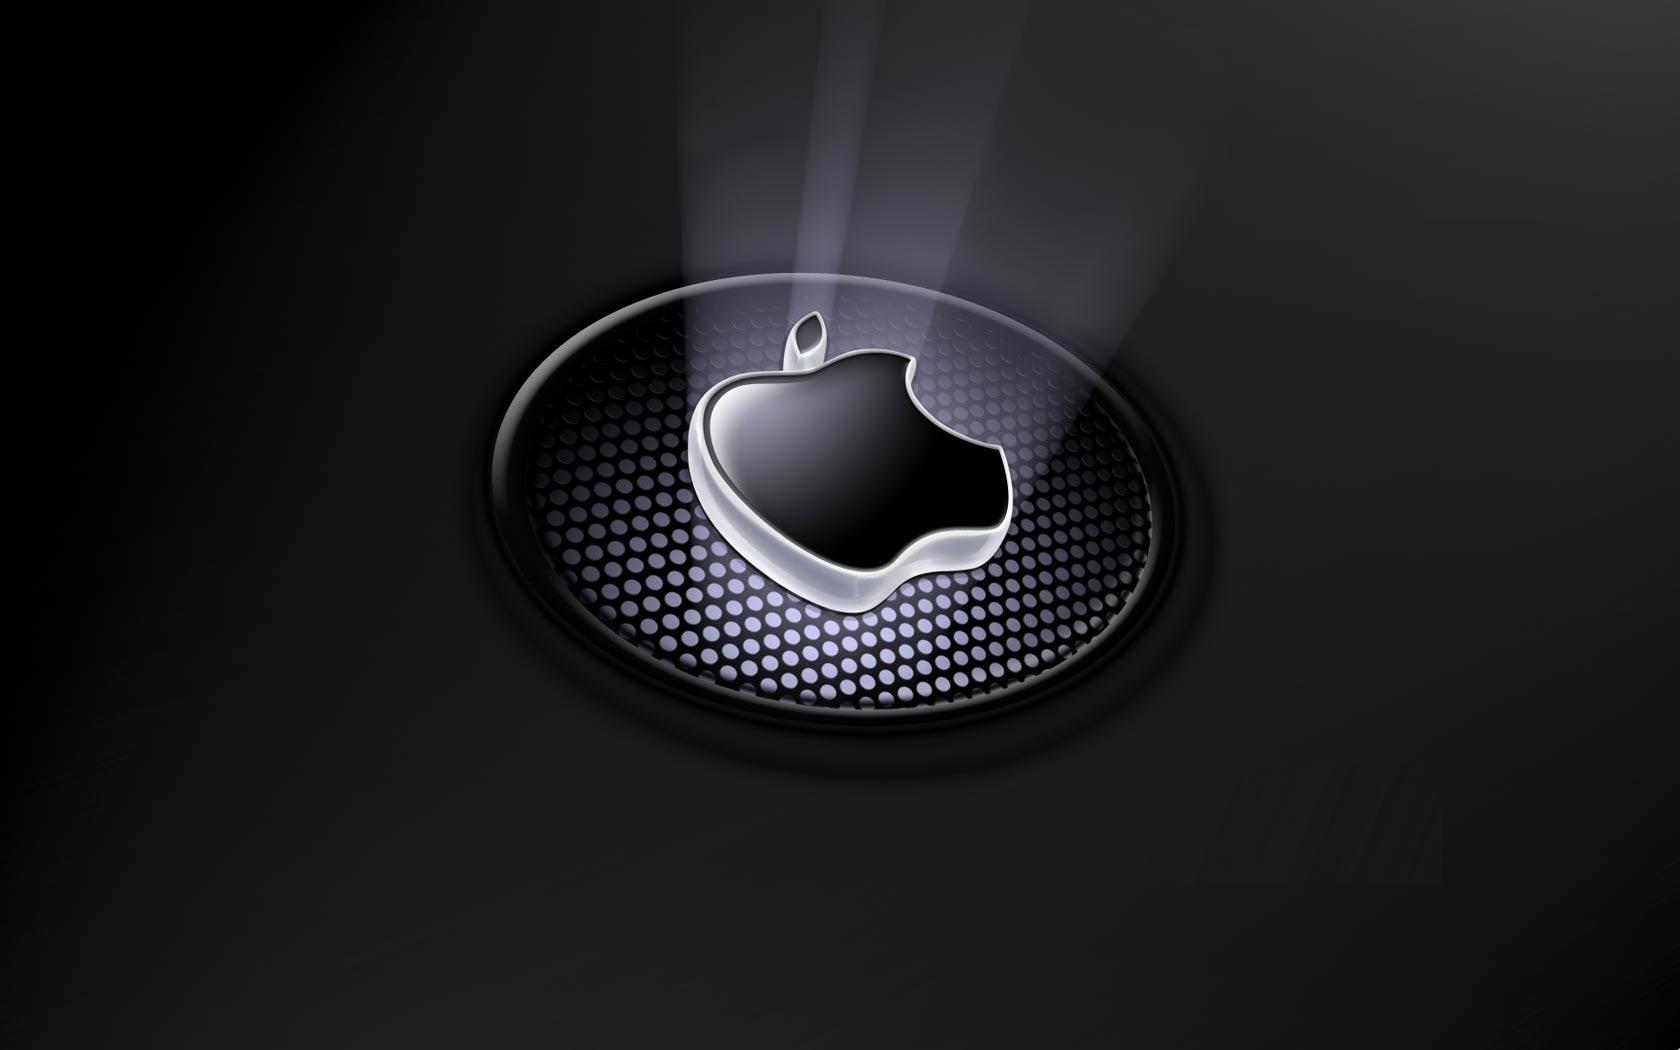 Apple logo wallpaper hd Wallpaper